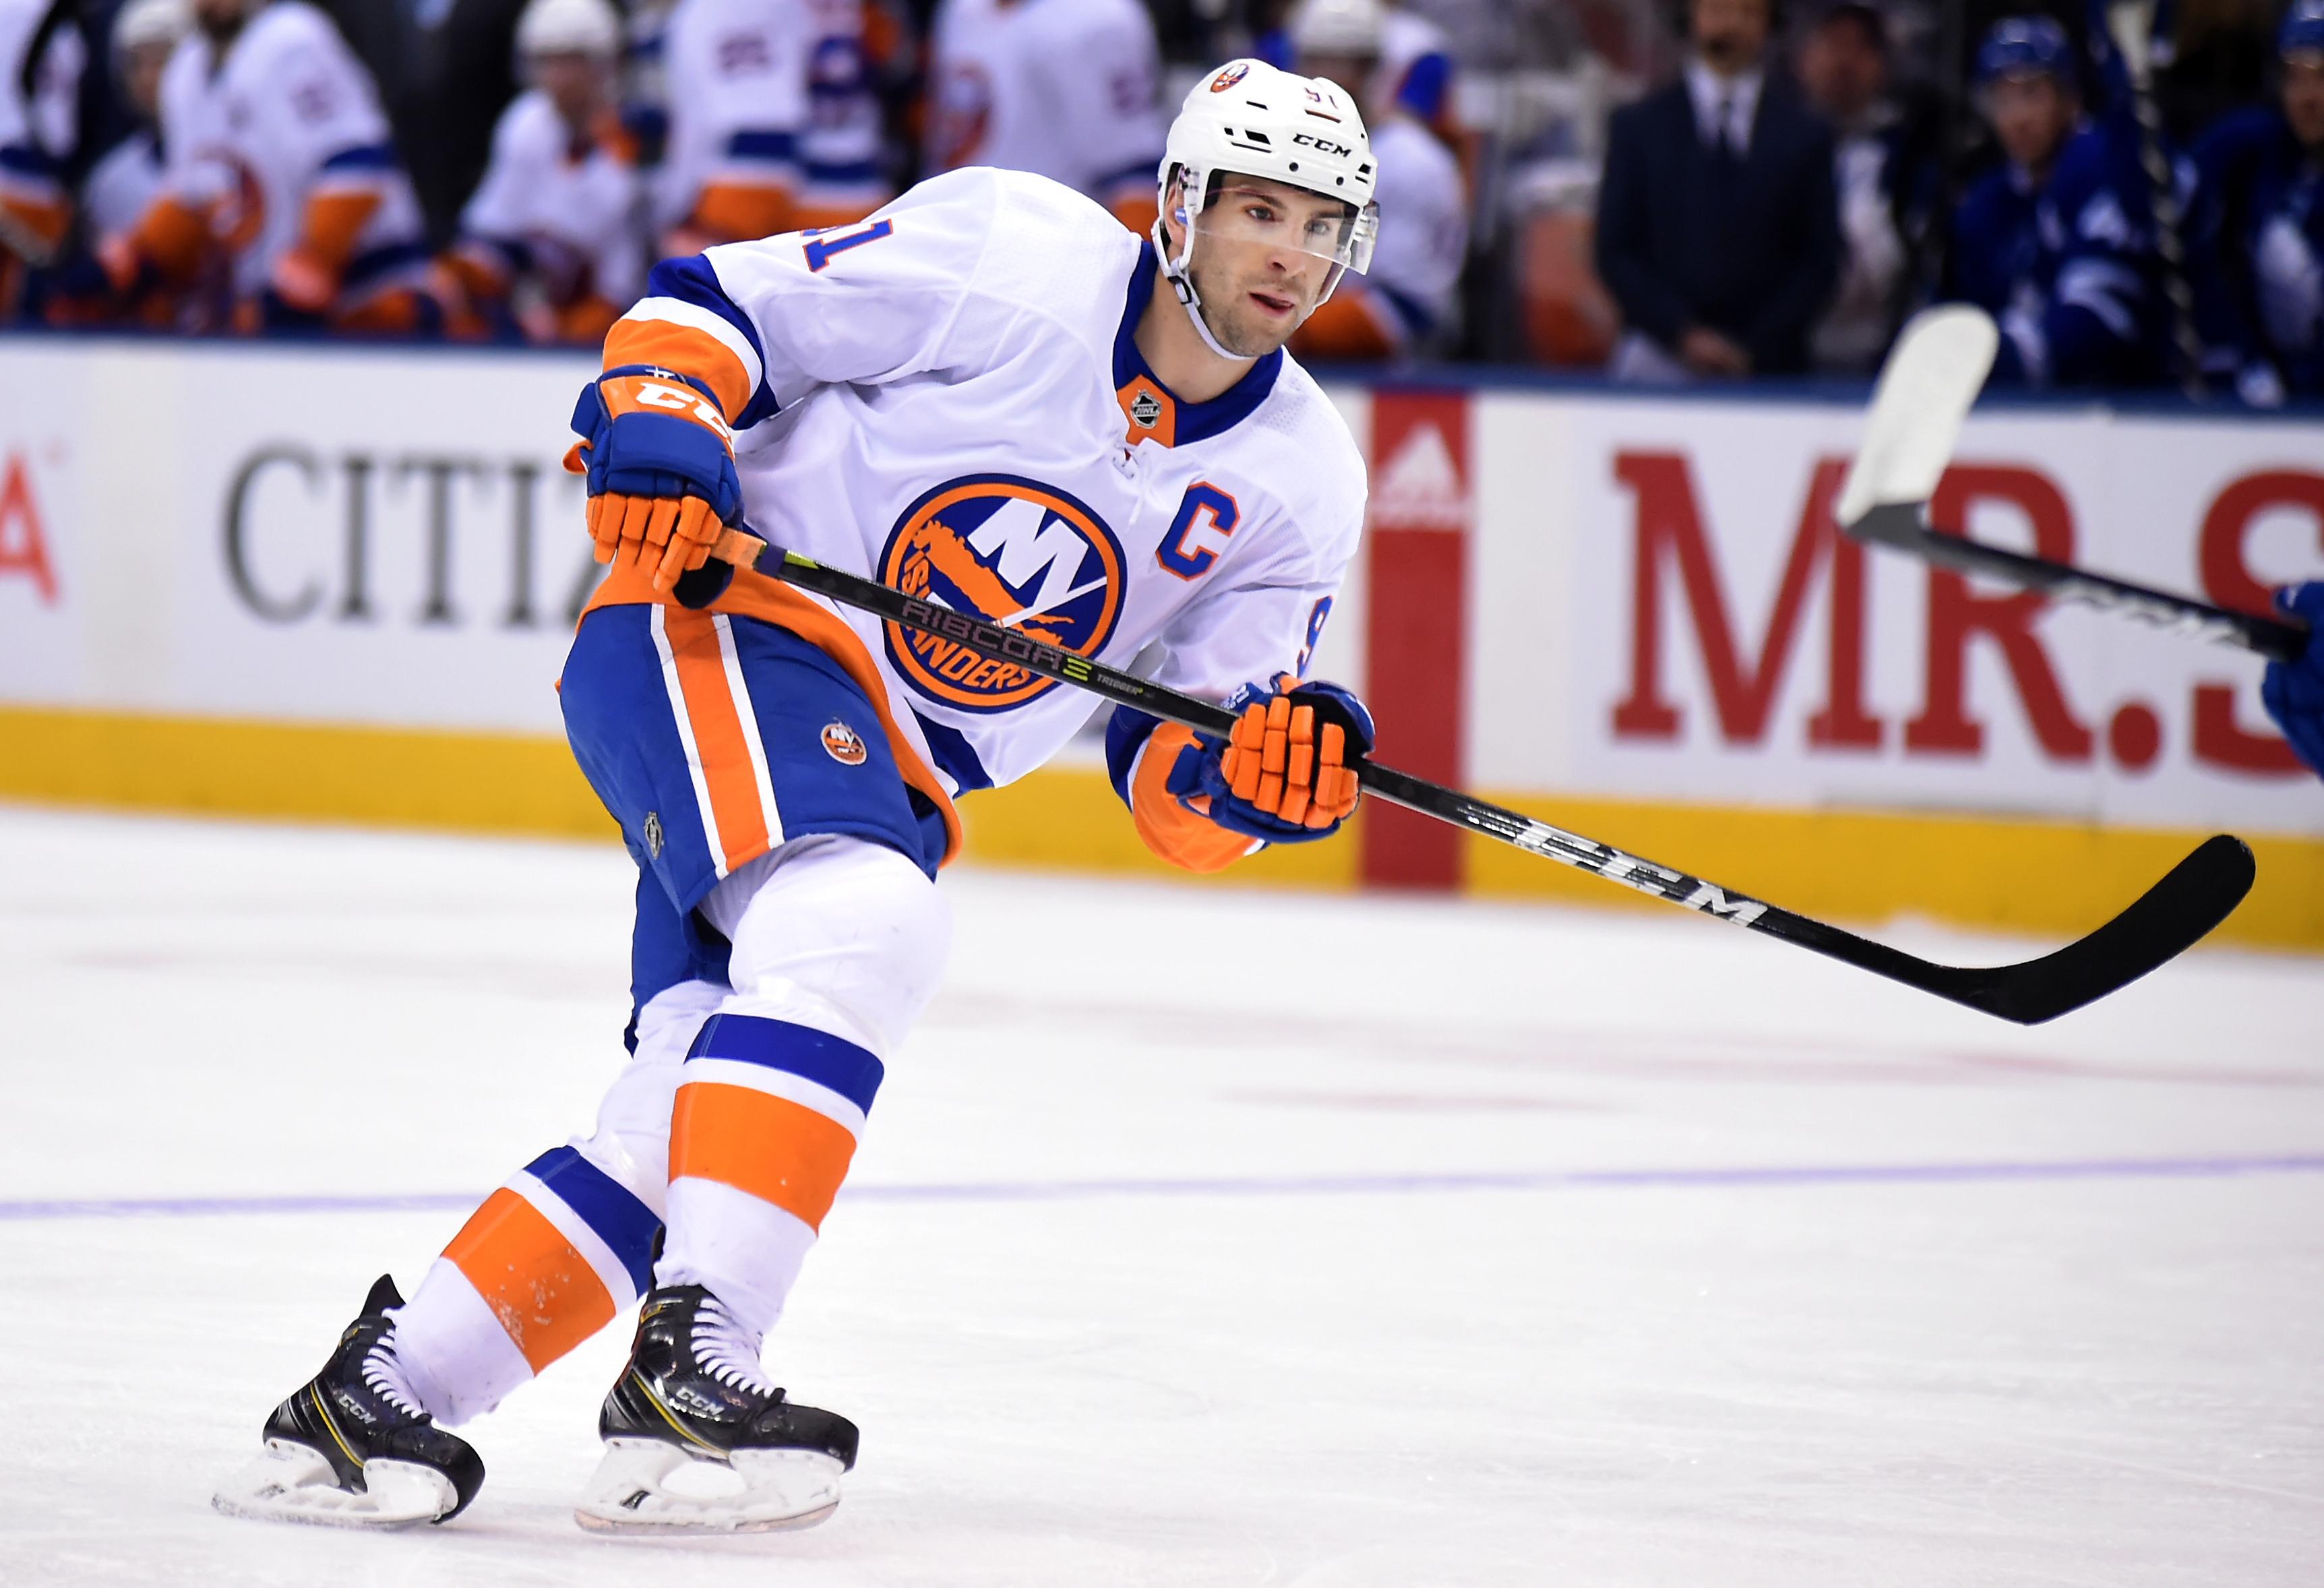 Jan 31, 2018; Toronto, Ontario, CAN; New York Islanders forward John Tavares (91) pursues the play against Toronto Maple Leafs at Air Canada Centre. Mandatory Credit: Dan Hamilton-USA TODAY Sports